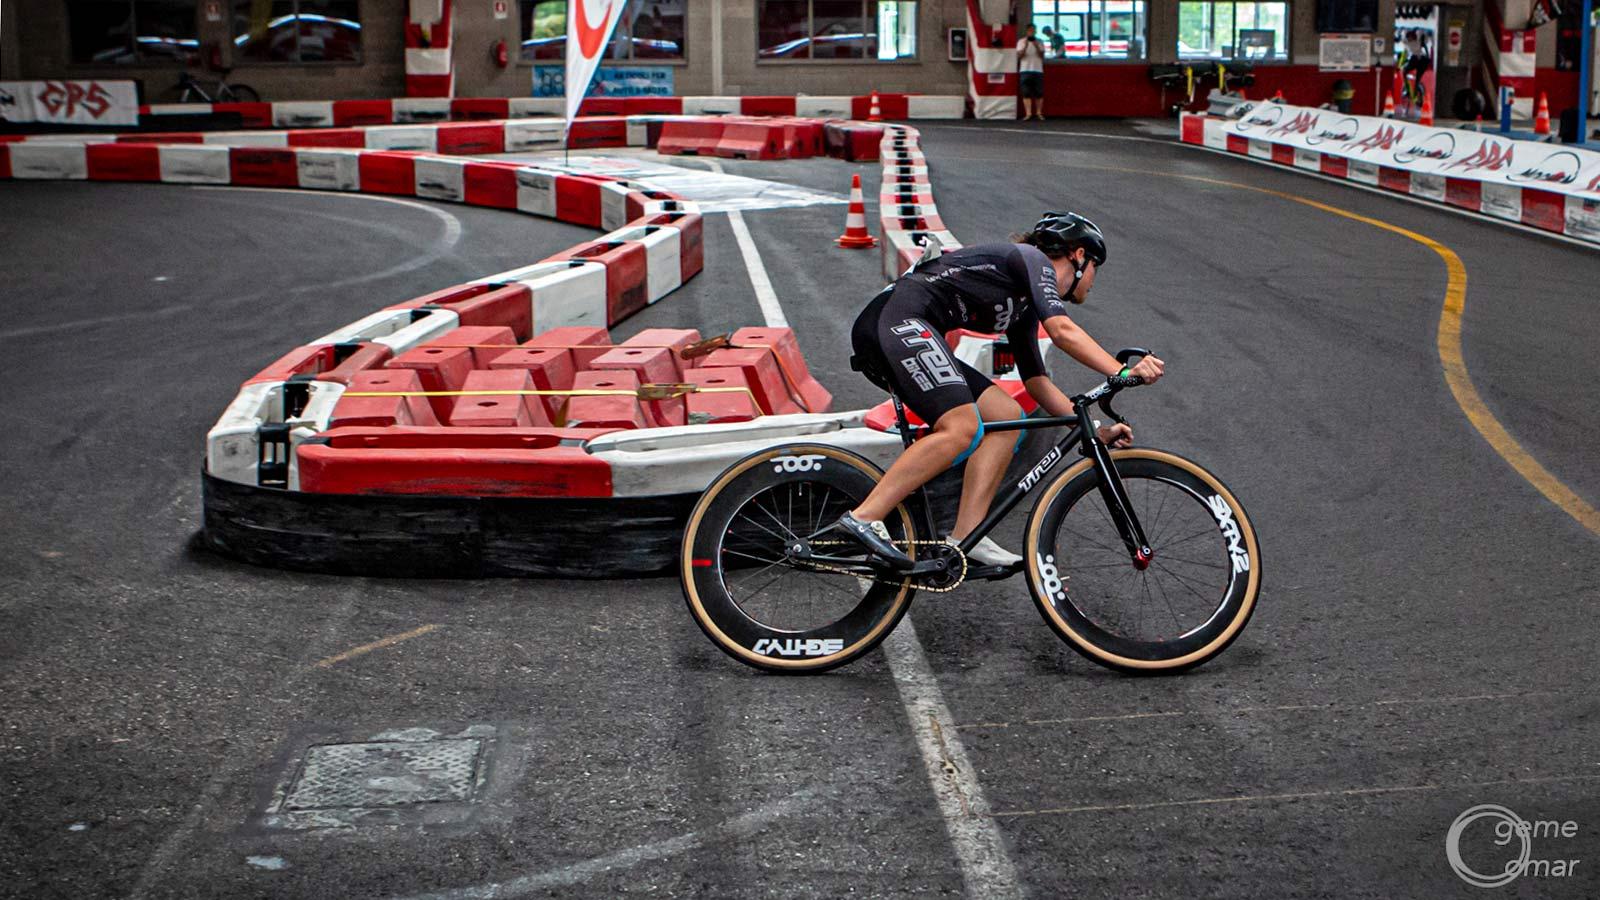 TRed SpeedWay Kartodrome flat track cart racing fixed gear bike, urban fixie racing,Francesca Selva, 2021 Italian Fixed Gear Champion, racing photo by Geme Omar DeLazzari